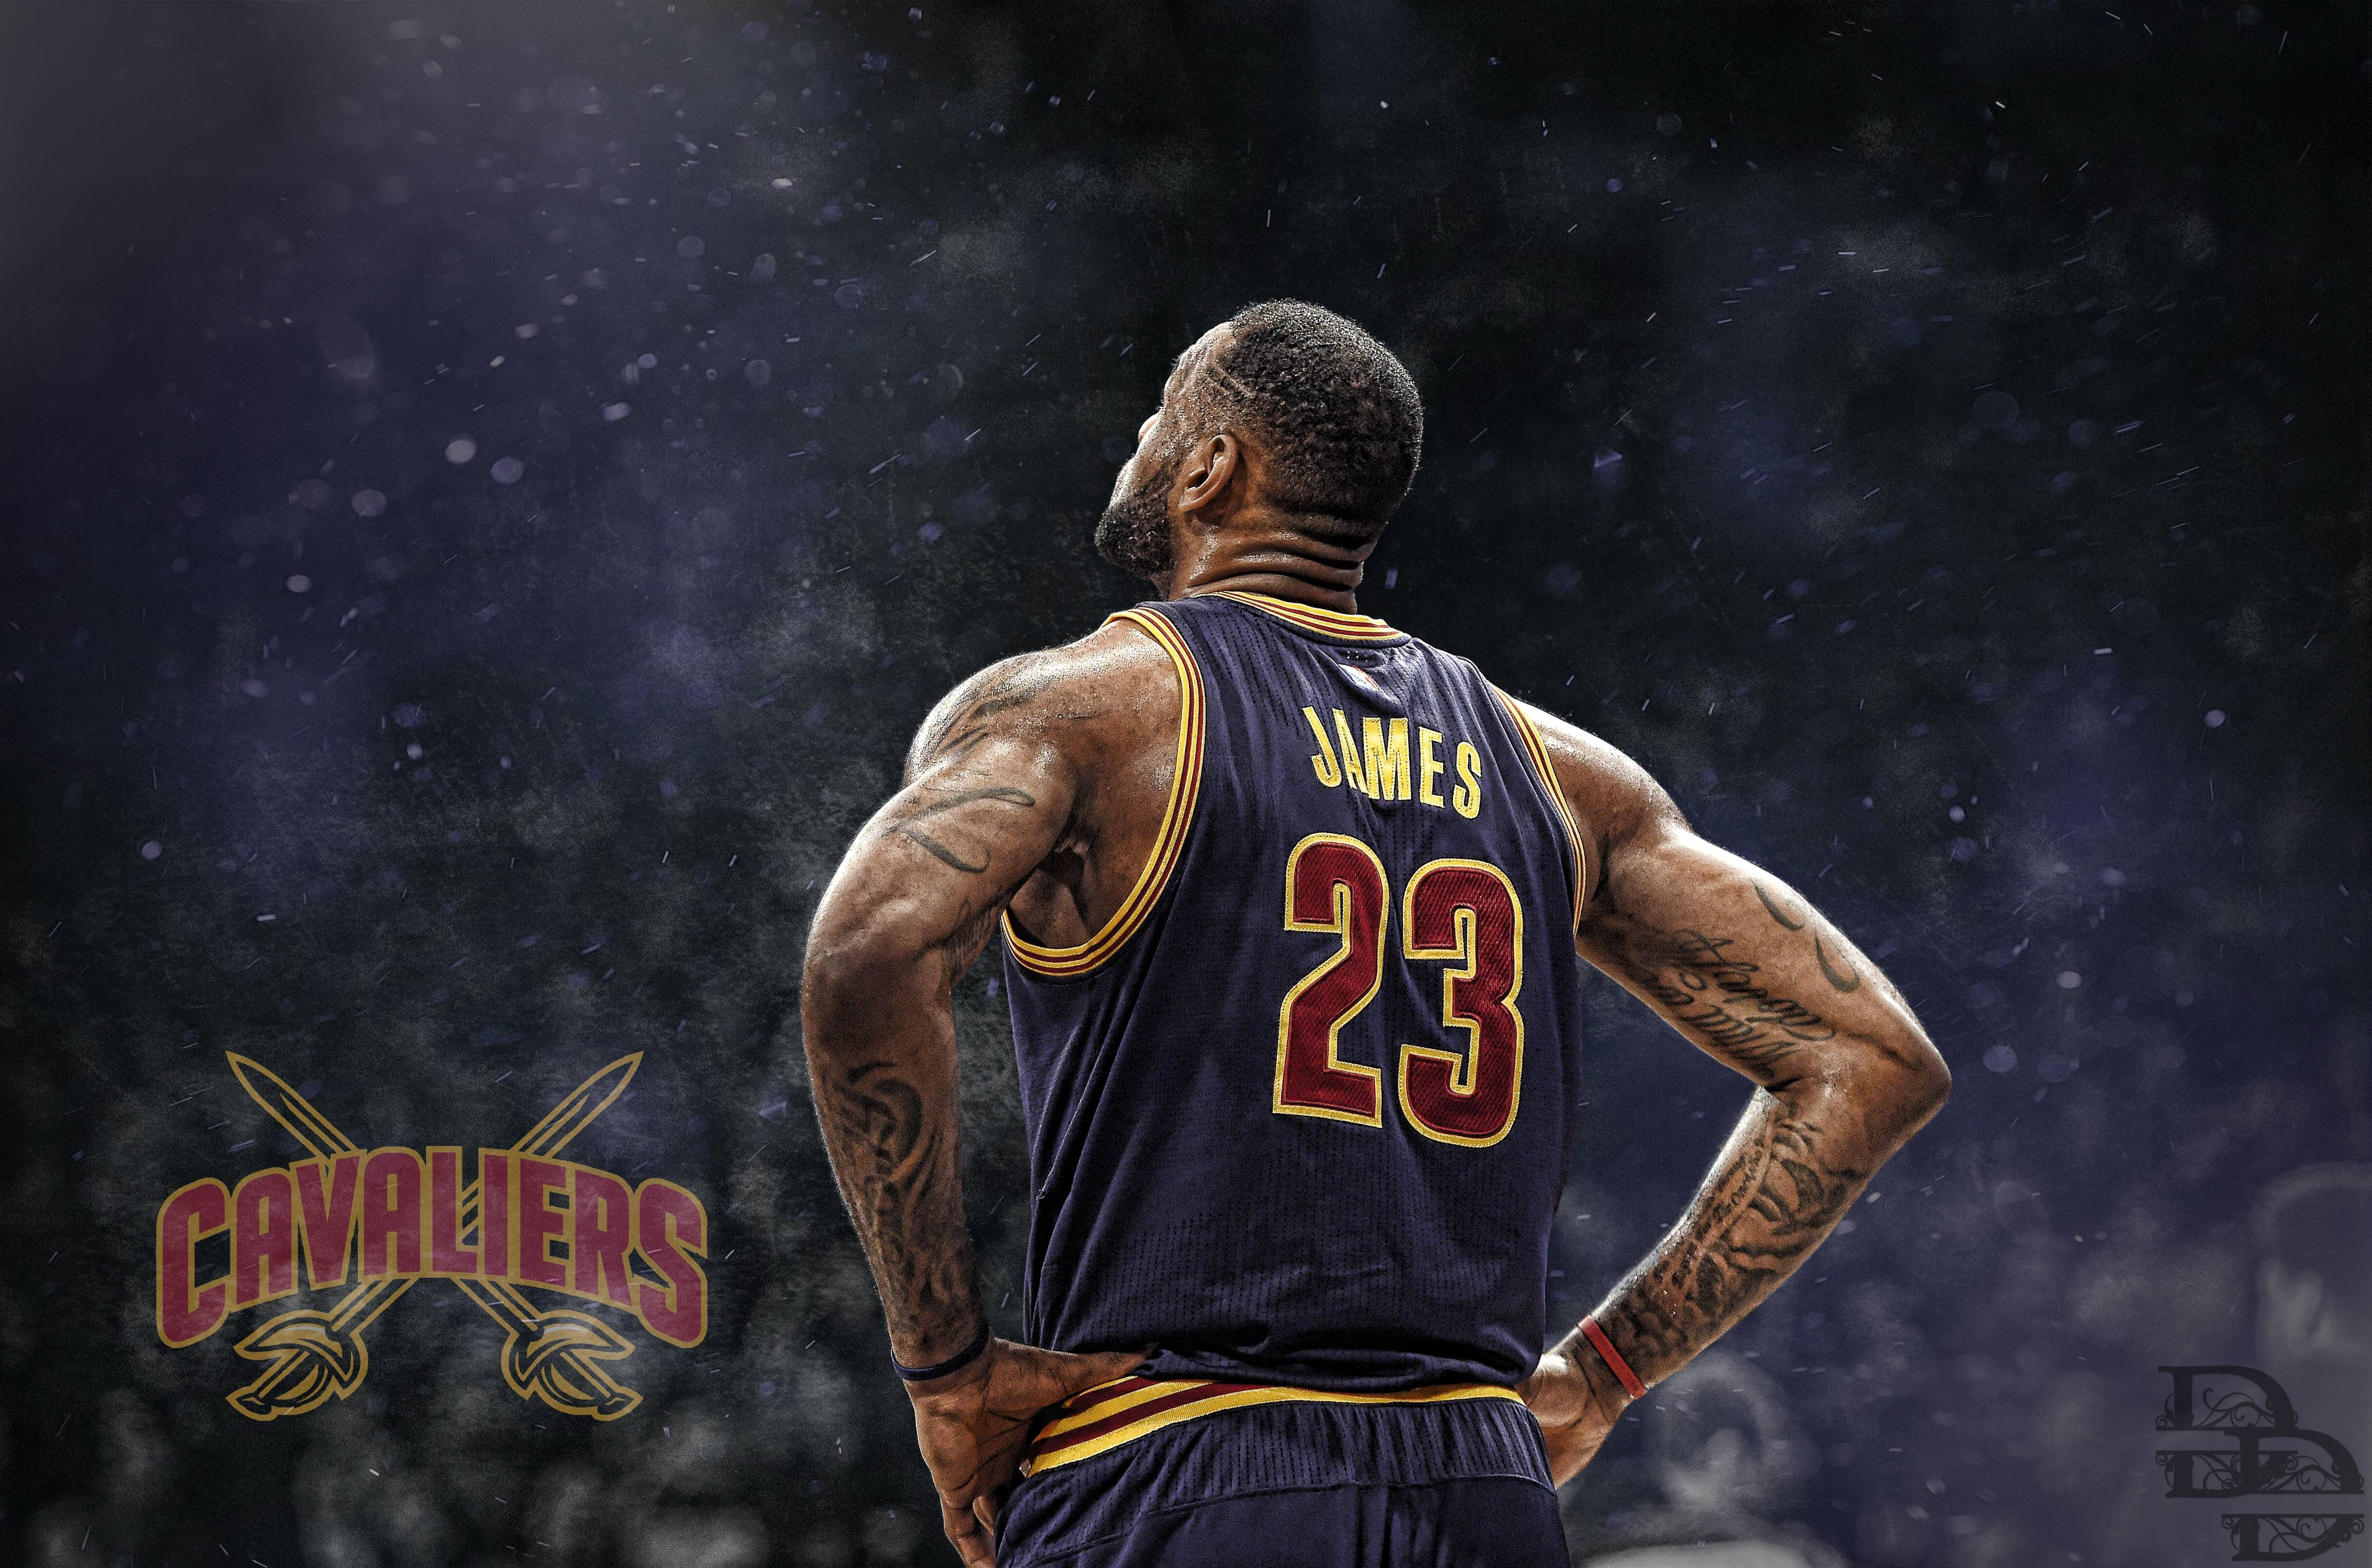 LeBron James Wallpapers Basketball Wallpapers at ...